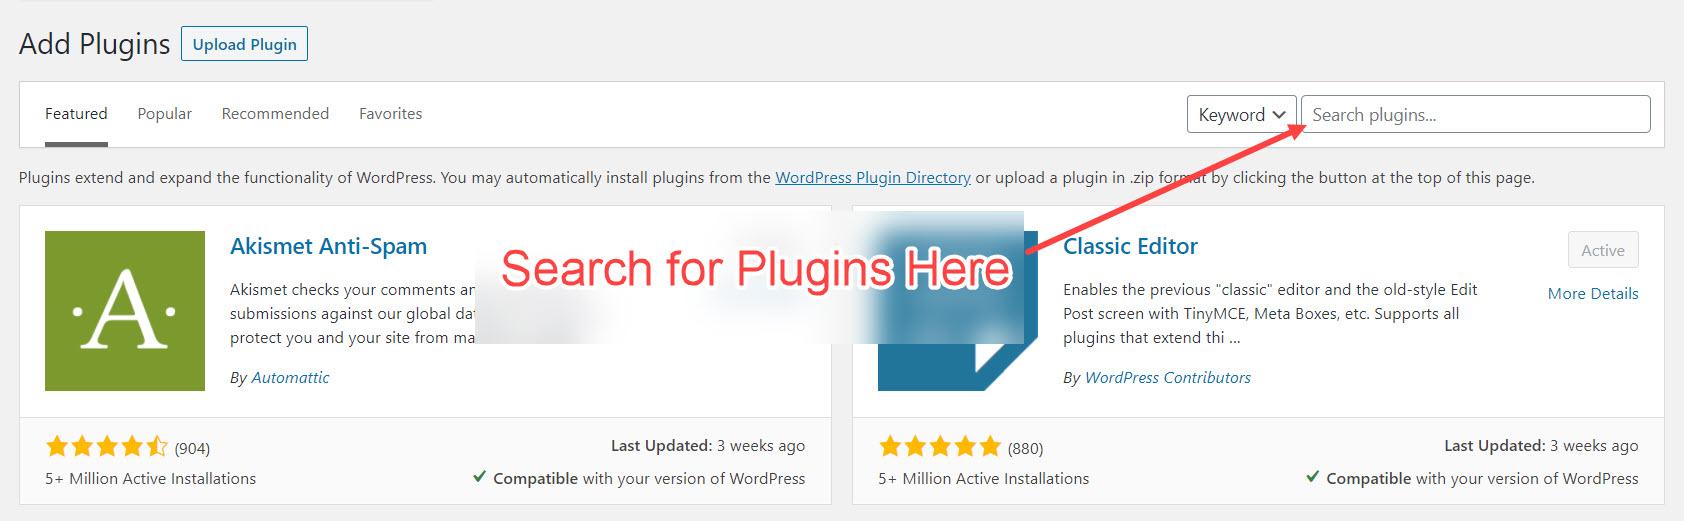 Adding Essential Plugins to Blog